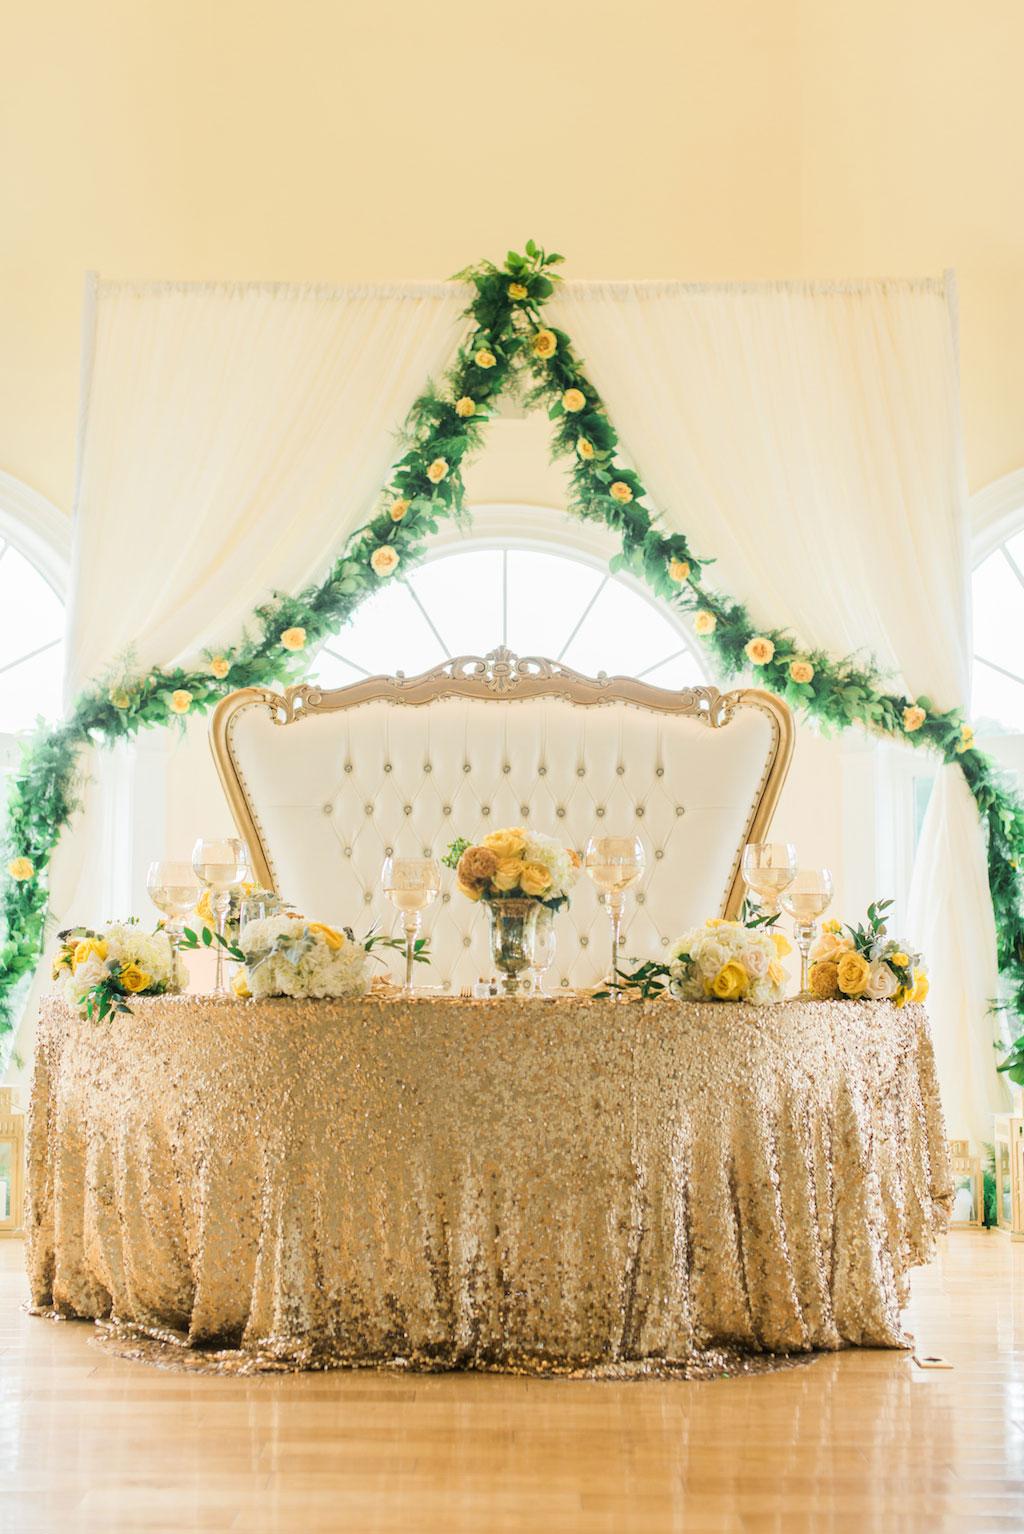 5-6-16-amazing-dc-wedding-flowers-17